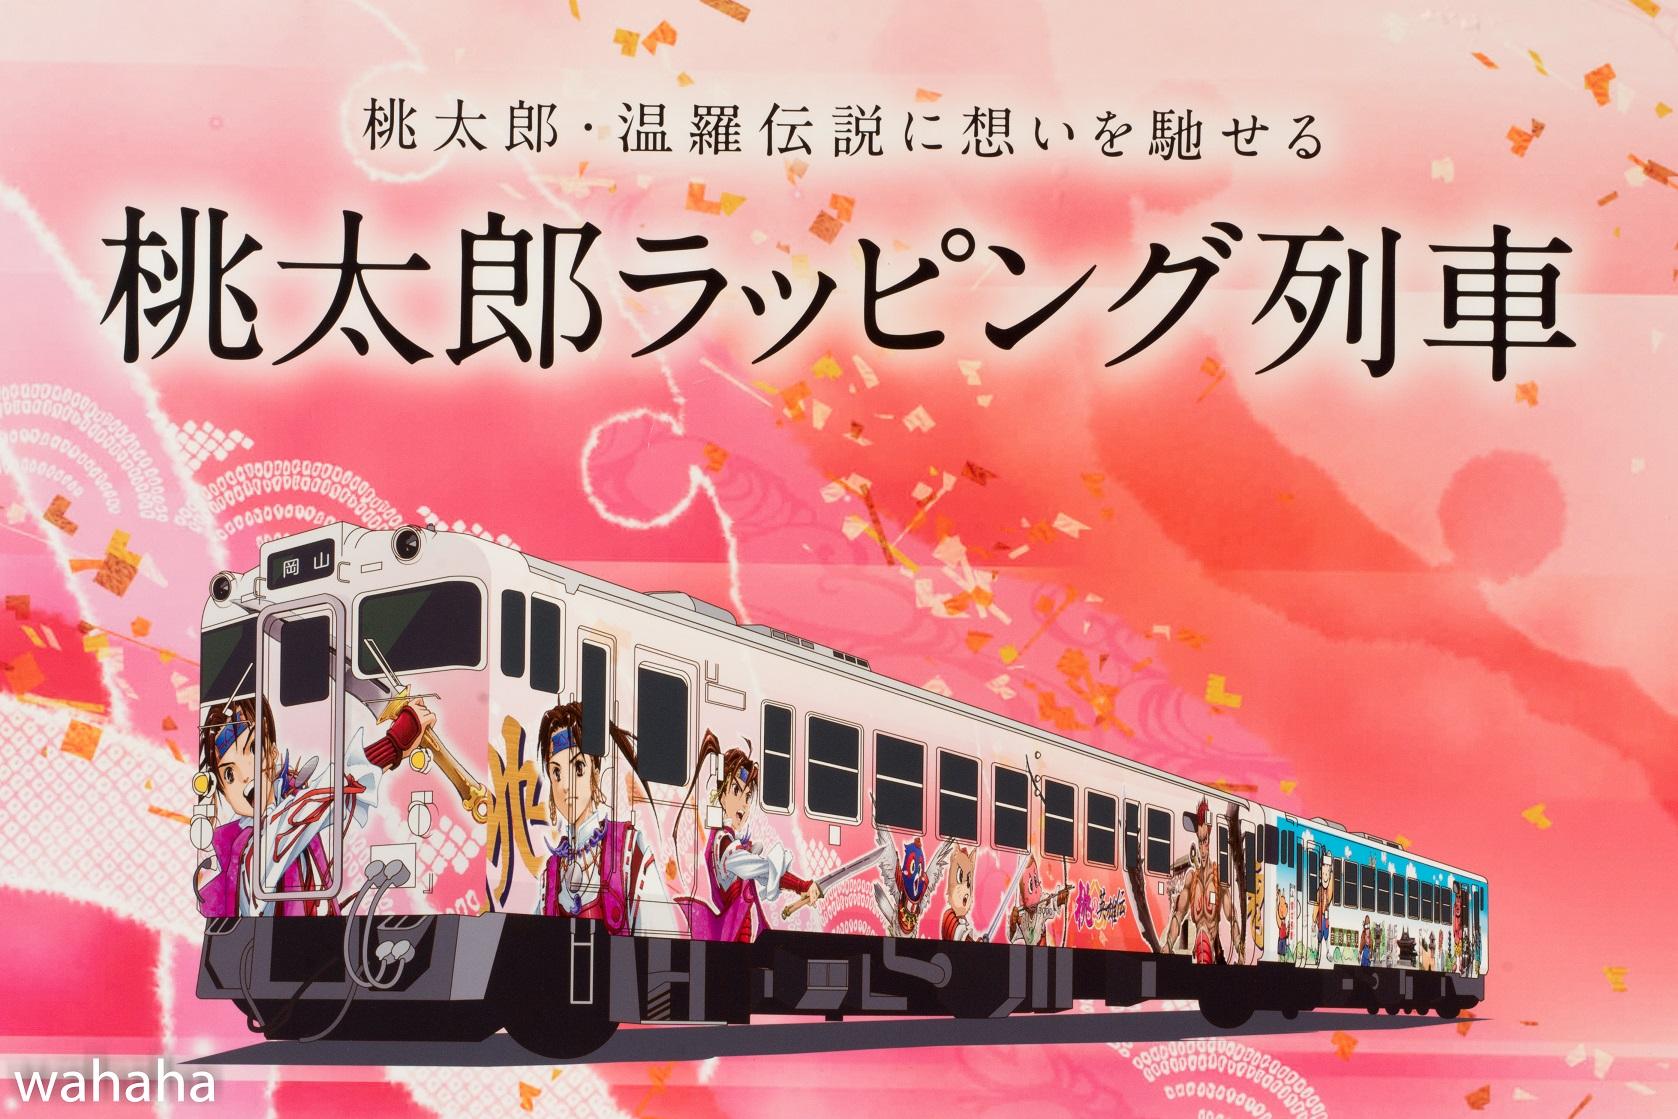 280522okayama-14-11p.jpg